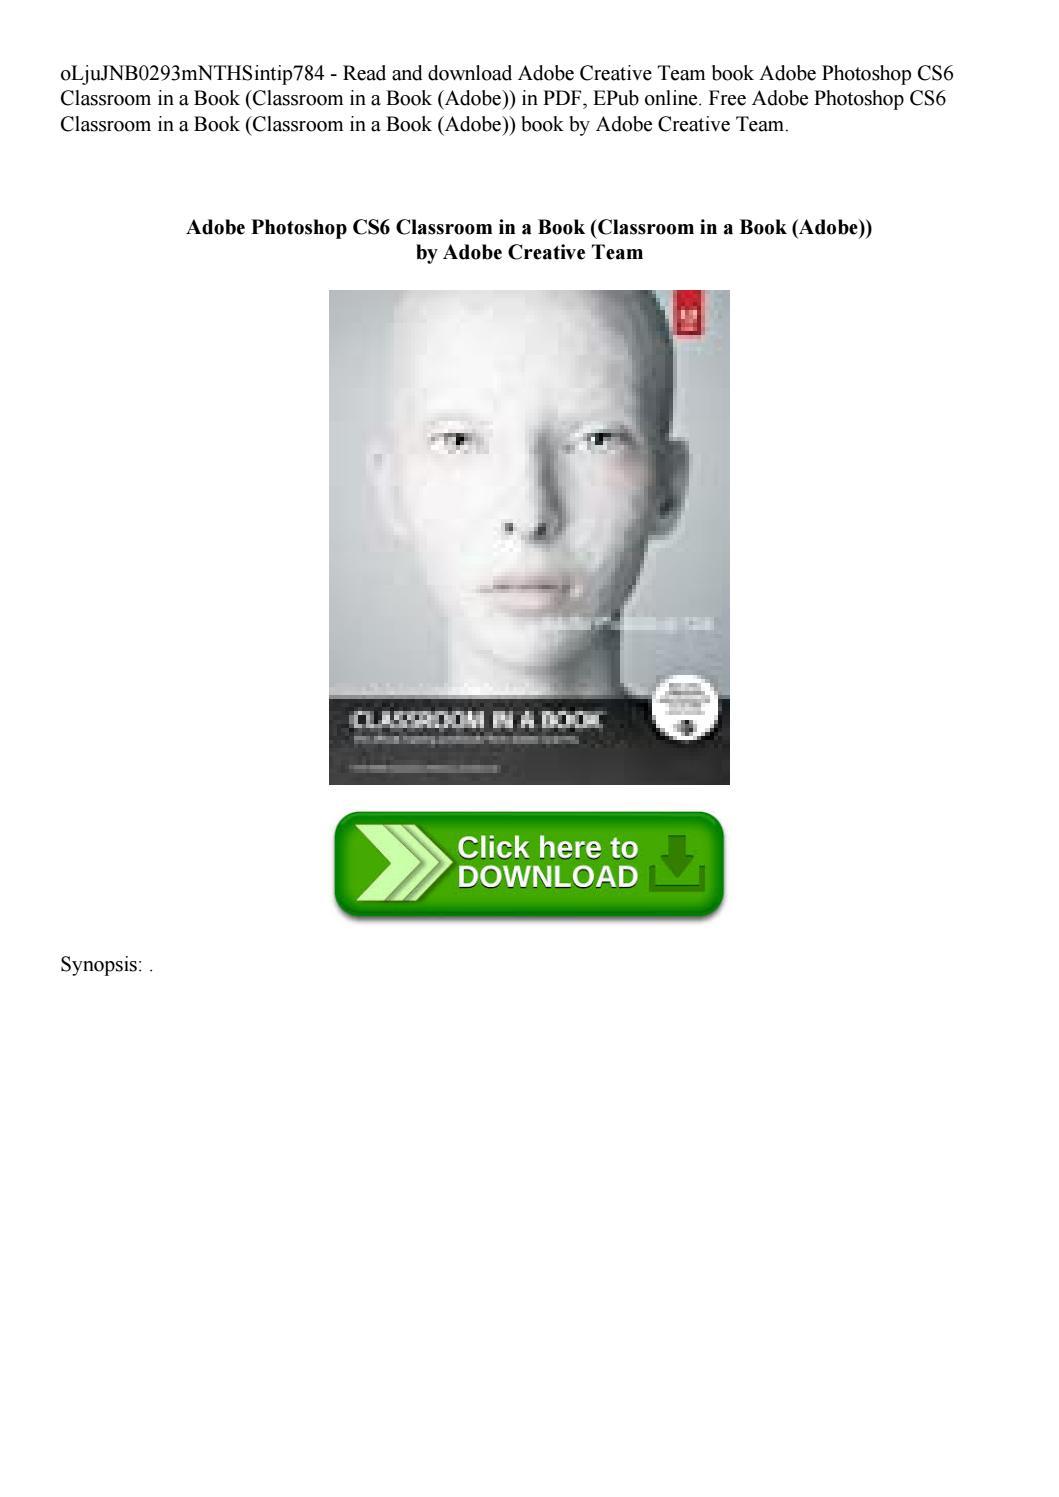 adobe photoshop cs6 classroom in a book free pdf